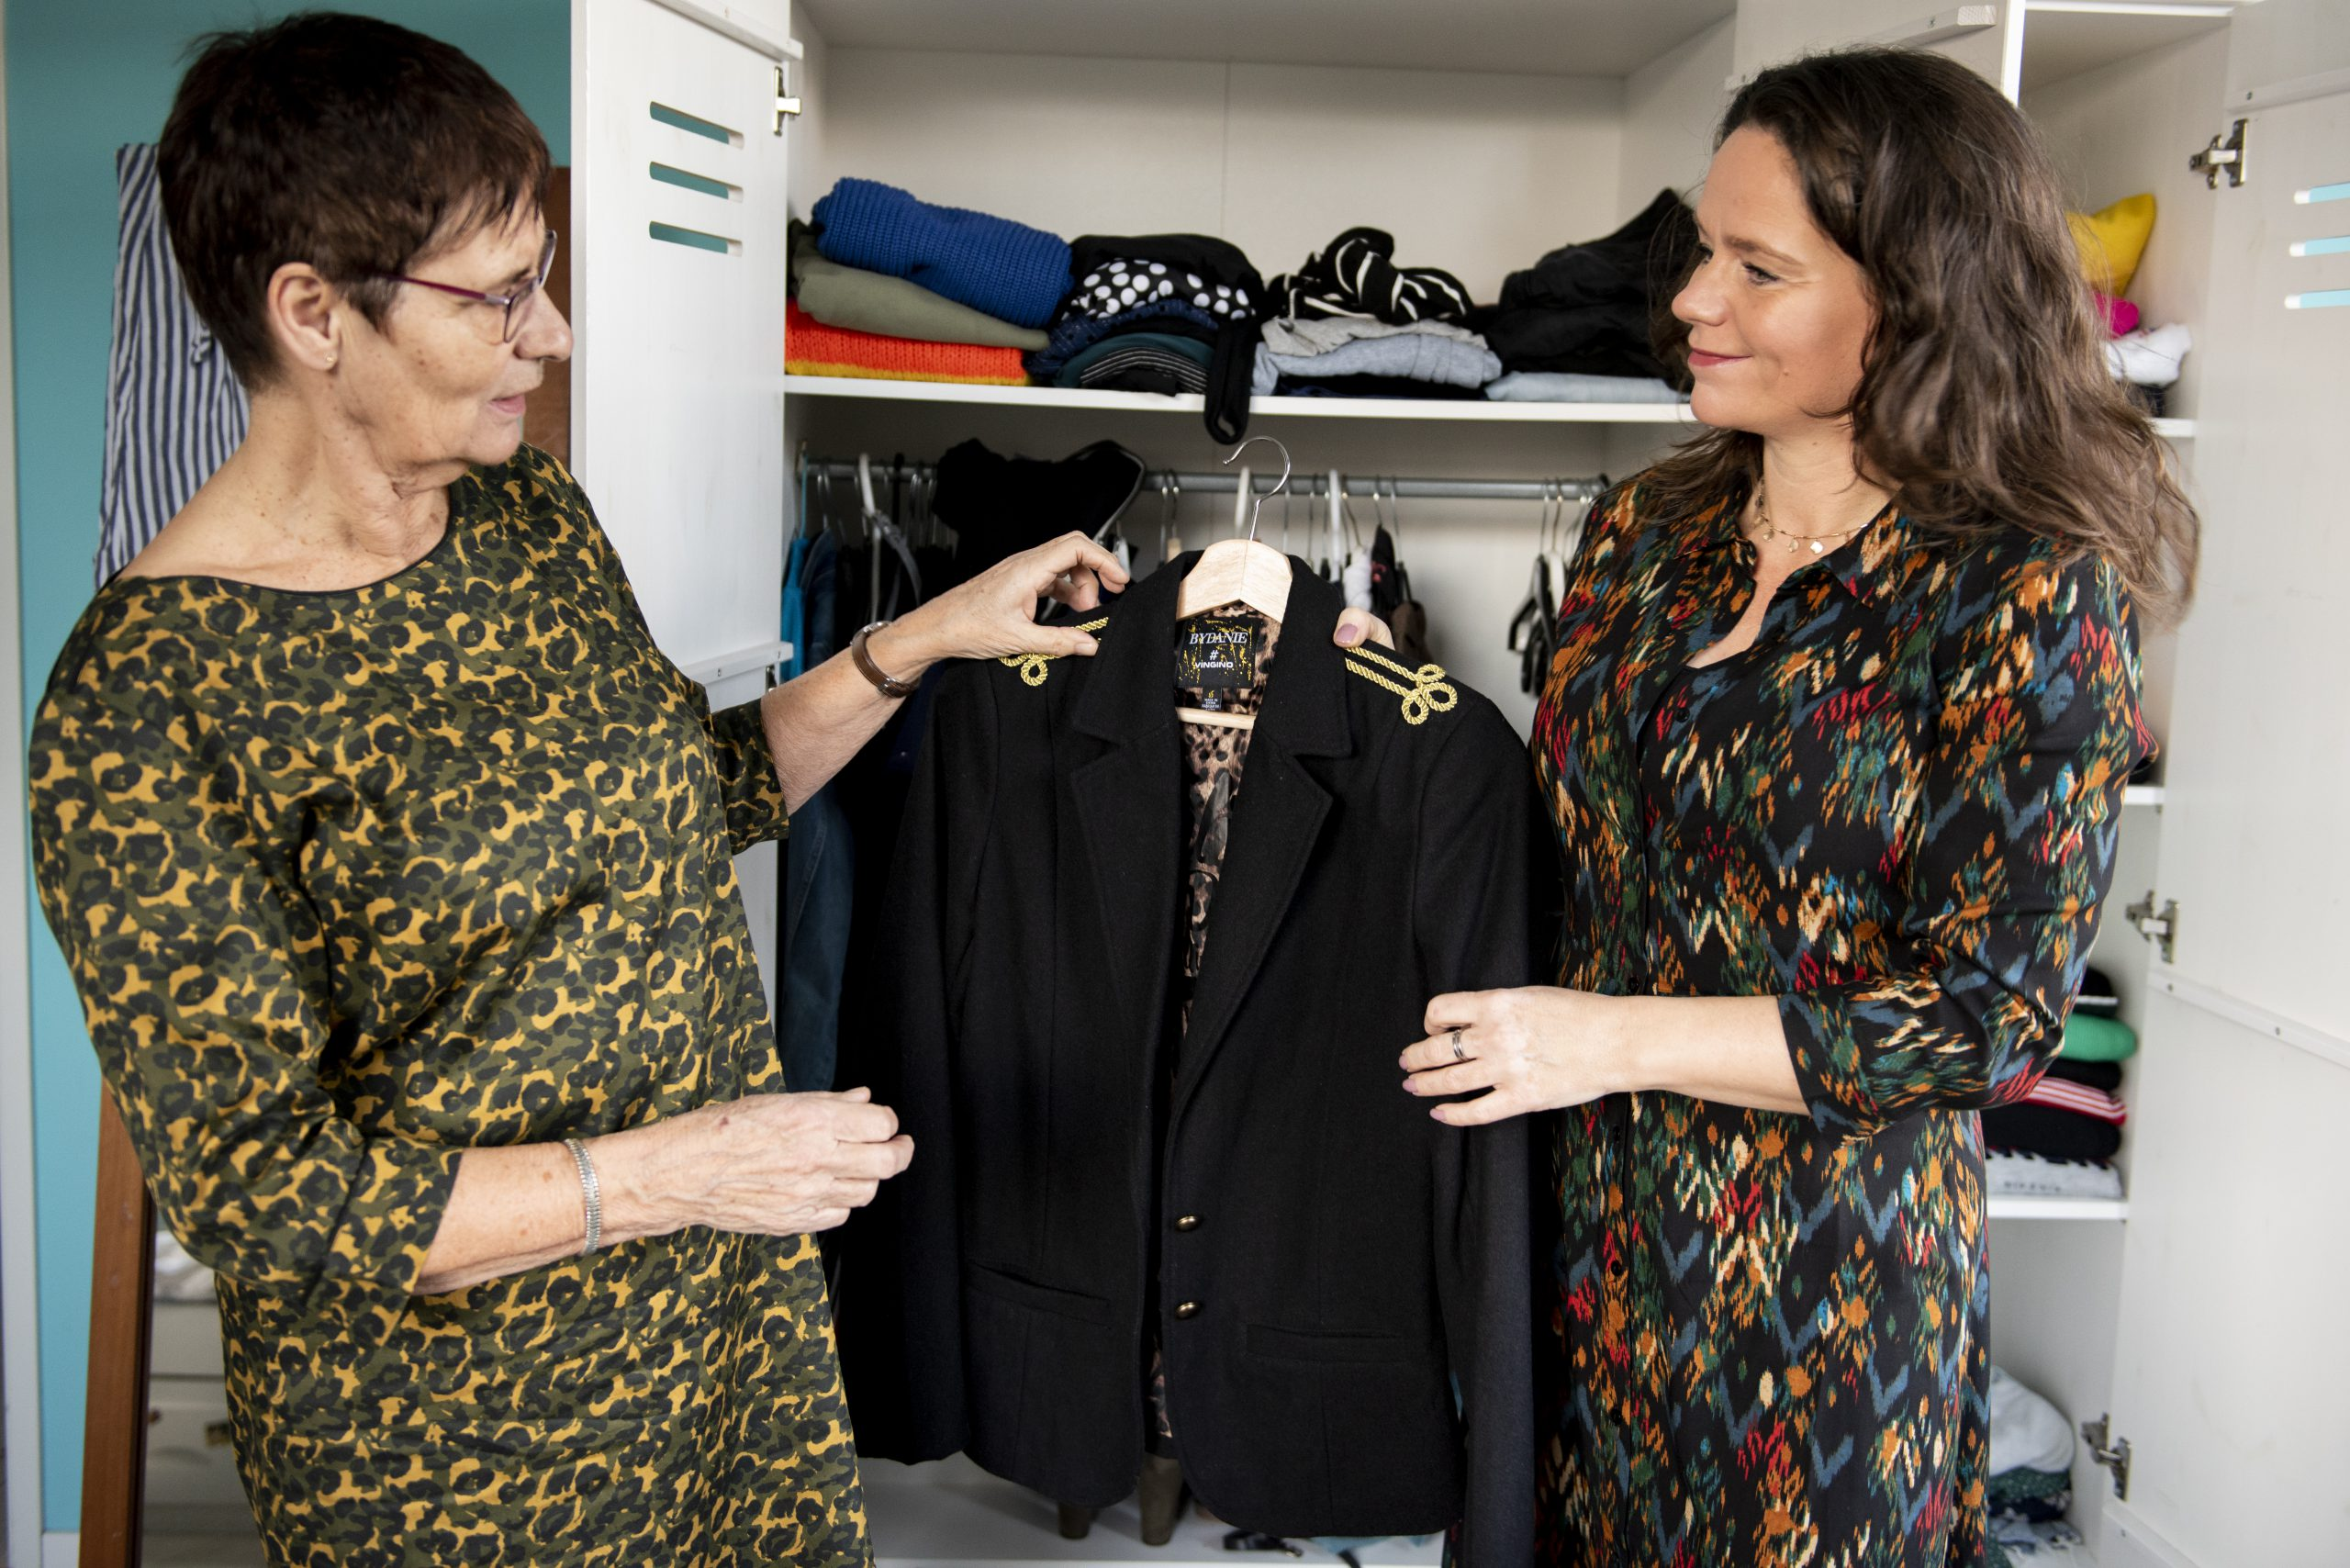 Kledingcoach Debby bij kledingkast met klant